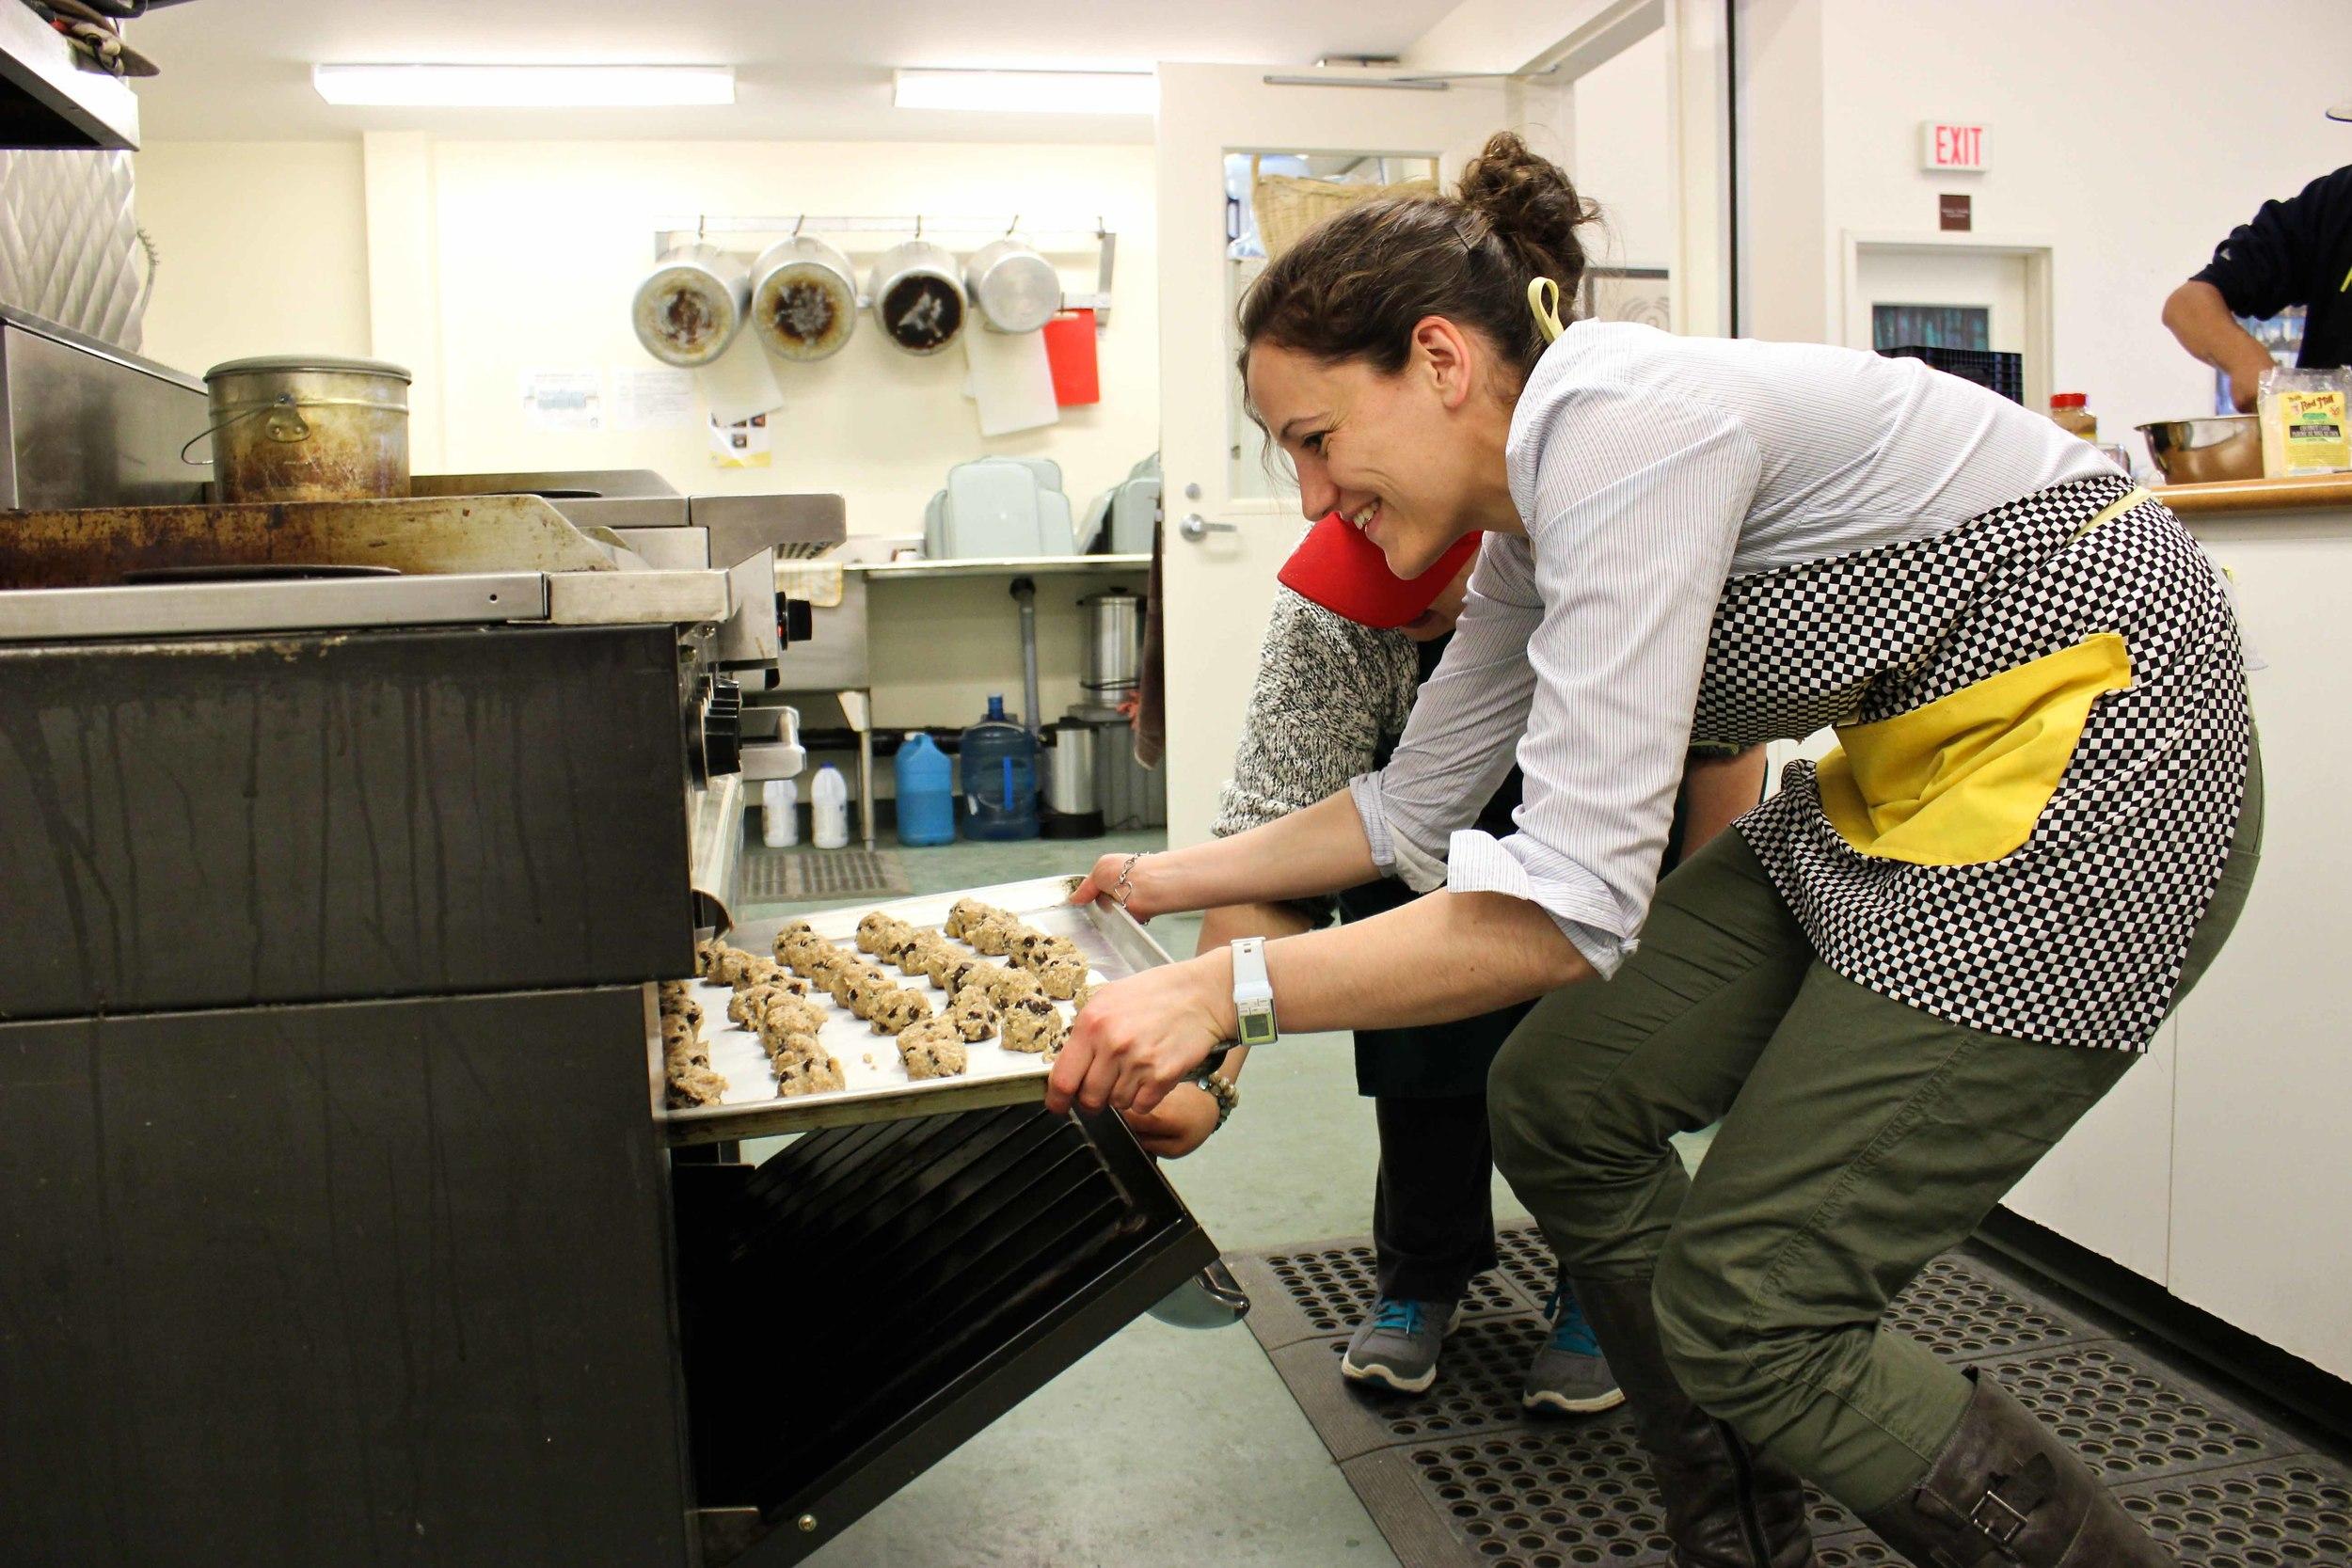 Volunteer extraordinaire, Arielle, baking a batch of cookies for dessert. Photo by Sarah Brandvold.